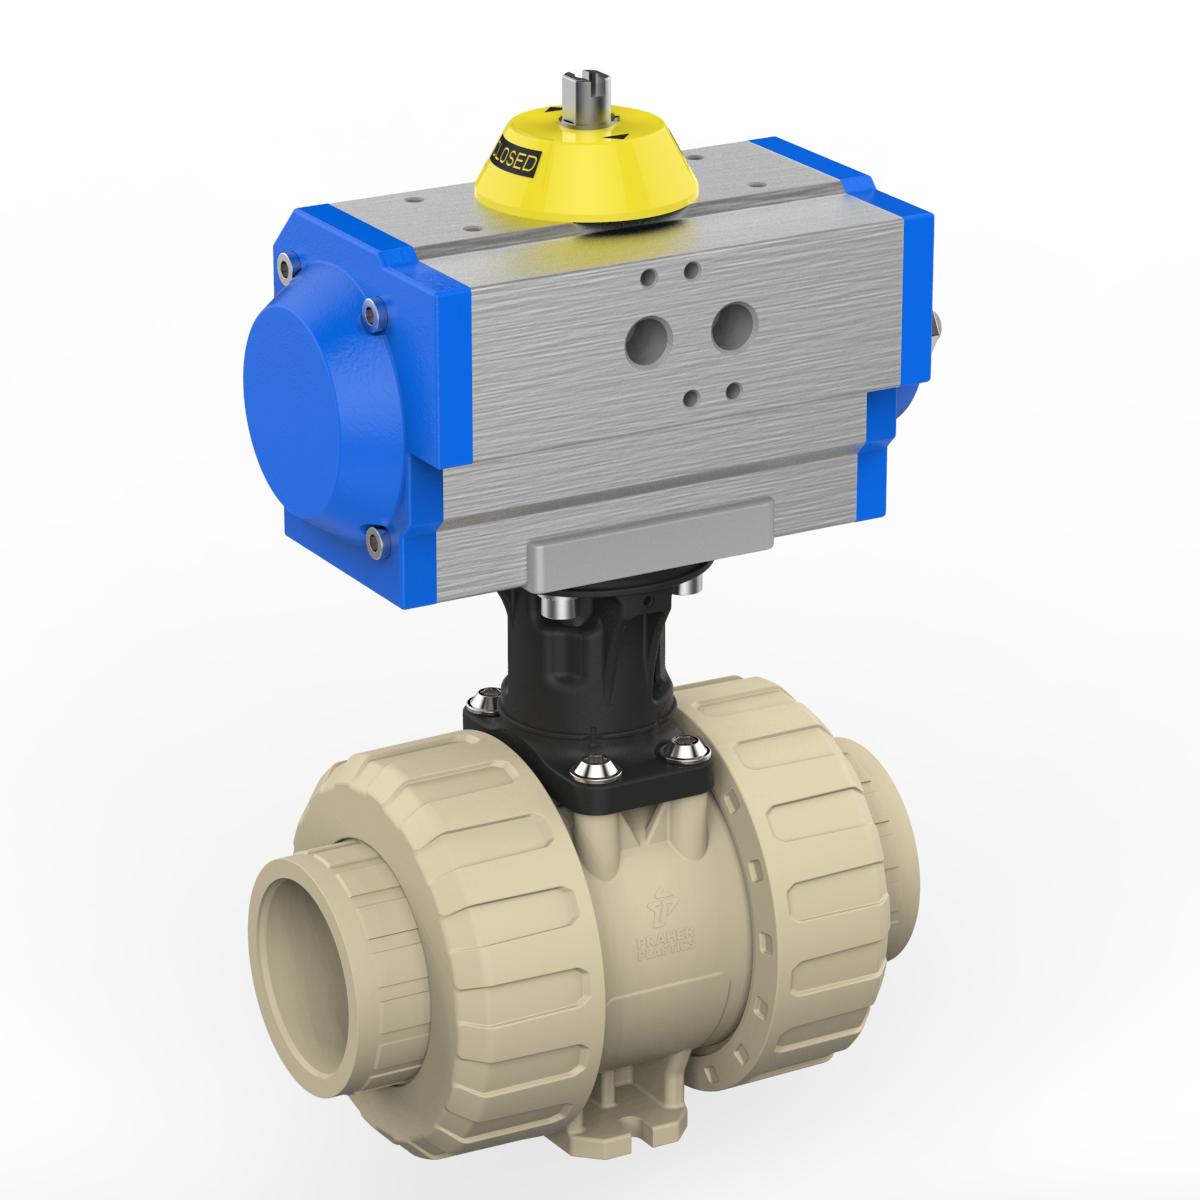 Praher 2-way Ball Valve M1 PP Pneumatic Actuator, beige, black, grey, blue and yellow